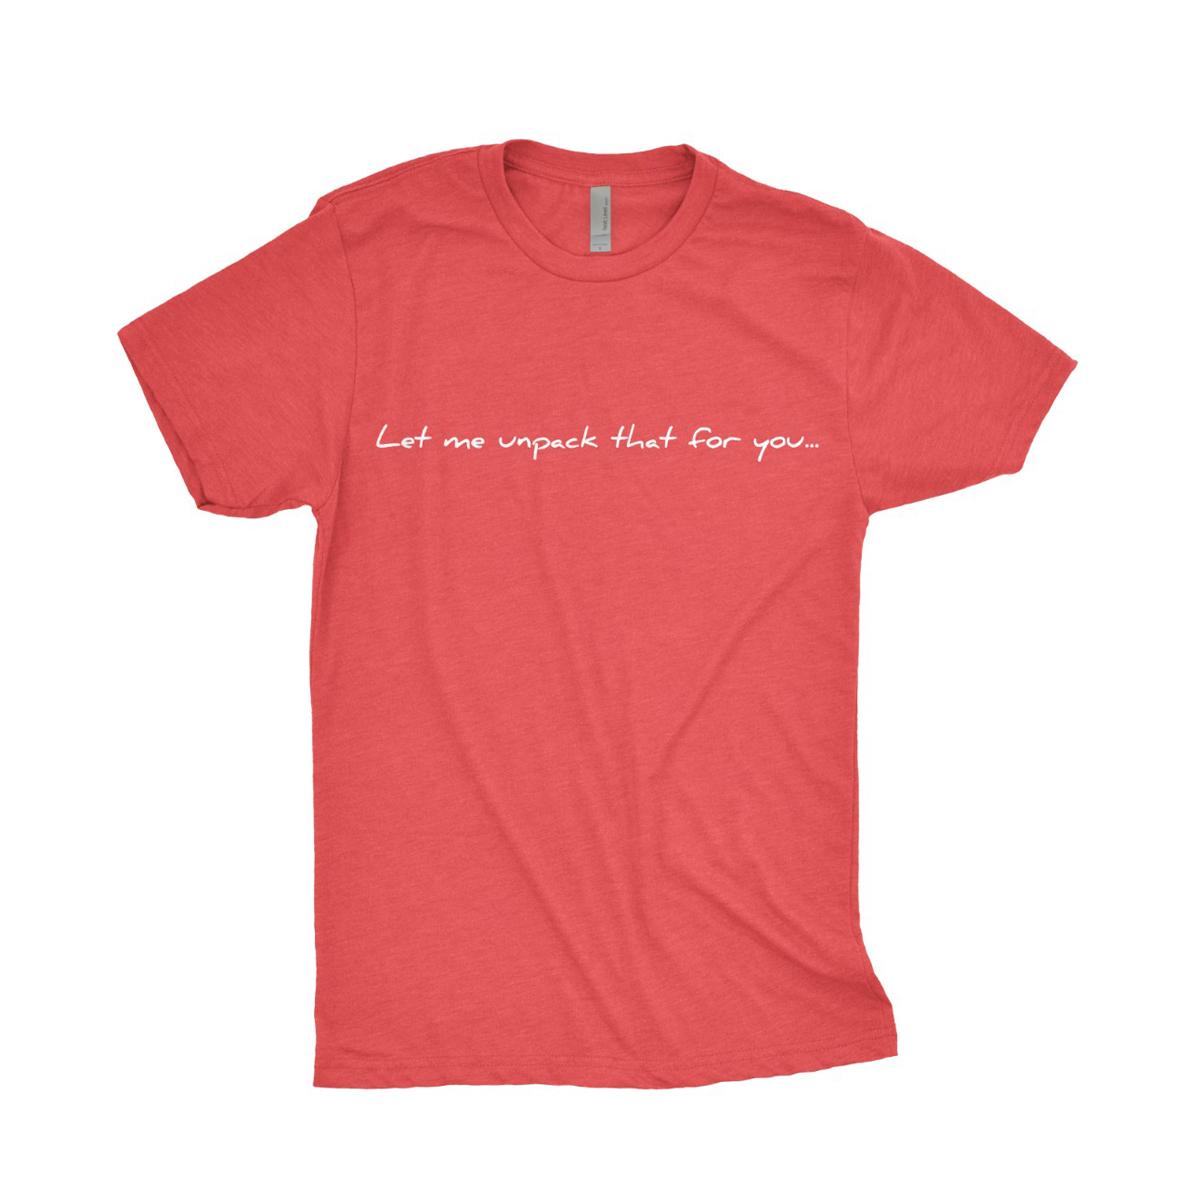 Unpack T-Shirt [Black/Red]